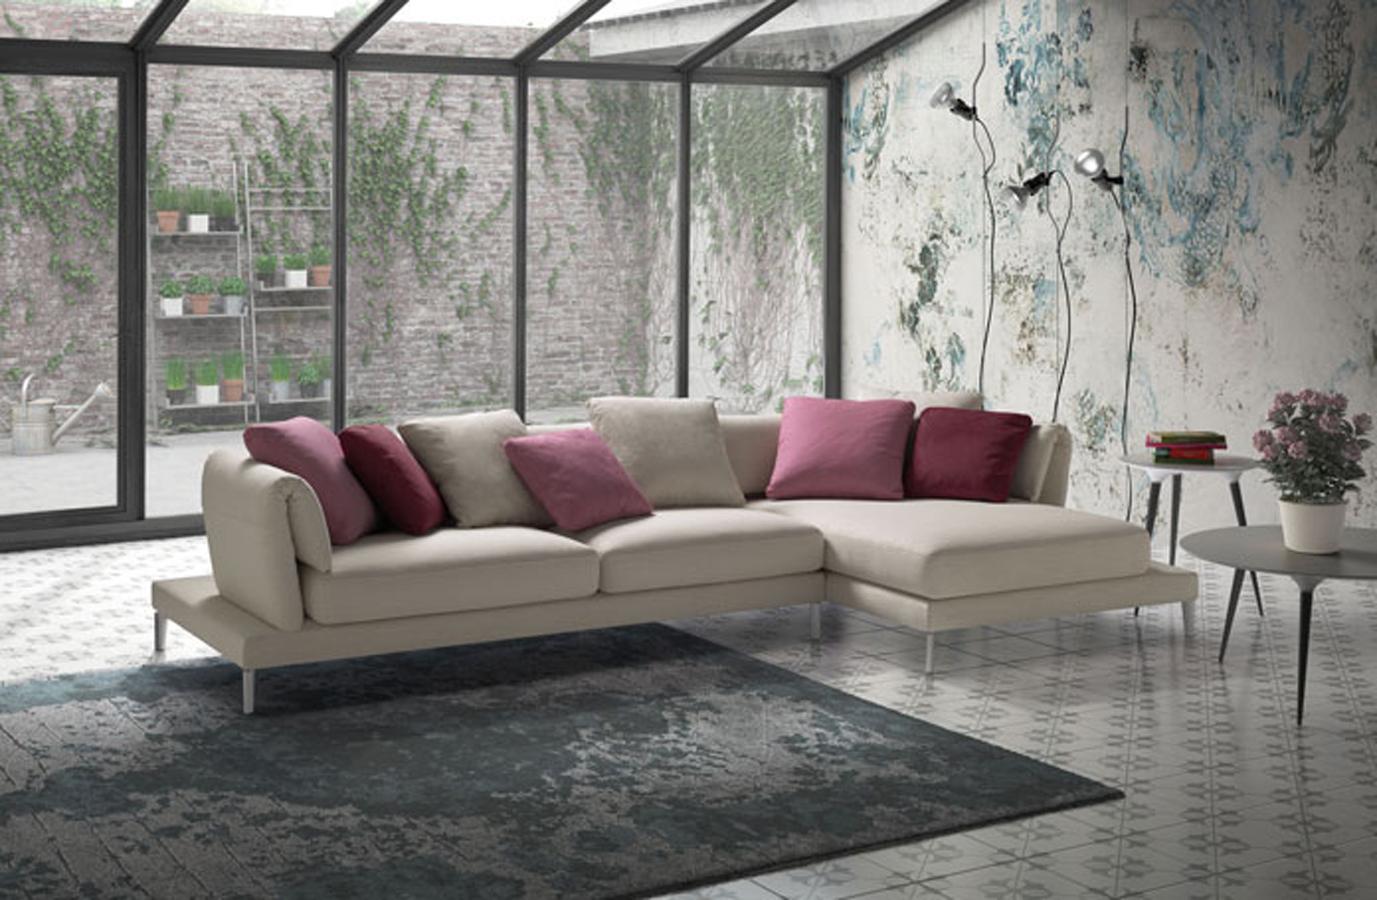 Samoa-divano-Upper-Twist-2-moderno-design-stoffa-pelle-ecopelle-angolo-3-2-posti-chaise-longue-arredamento-mobili-righetti-novara